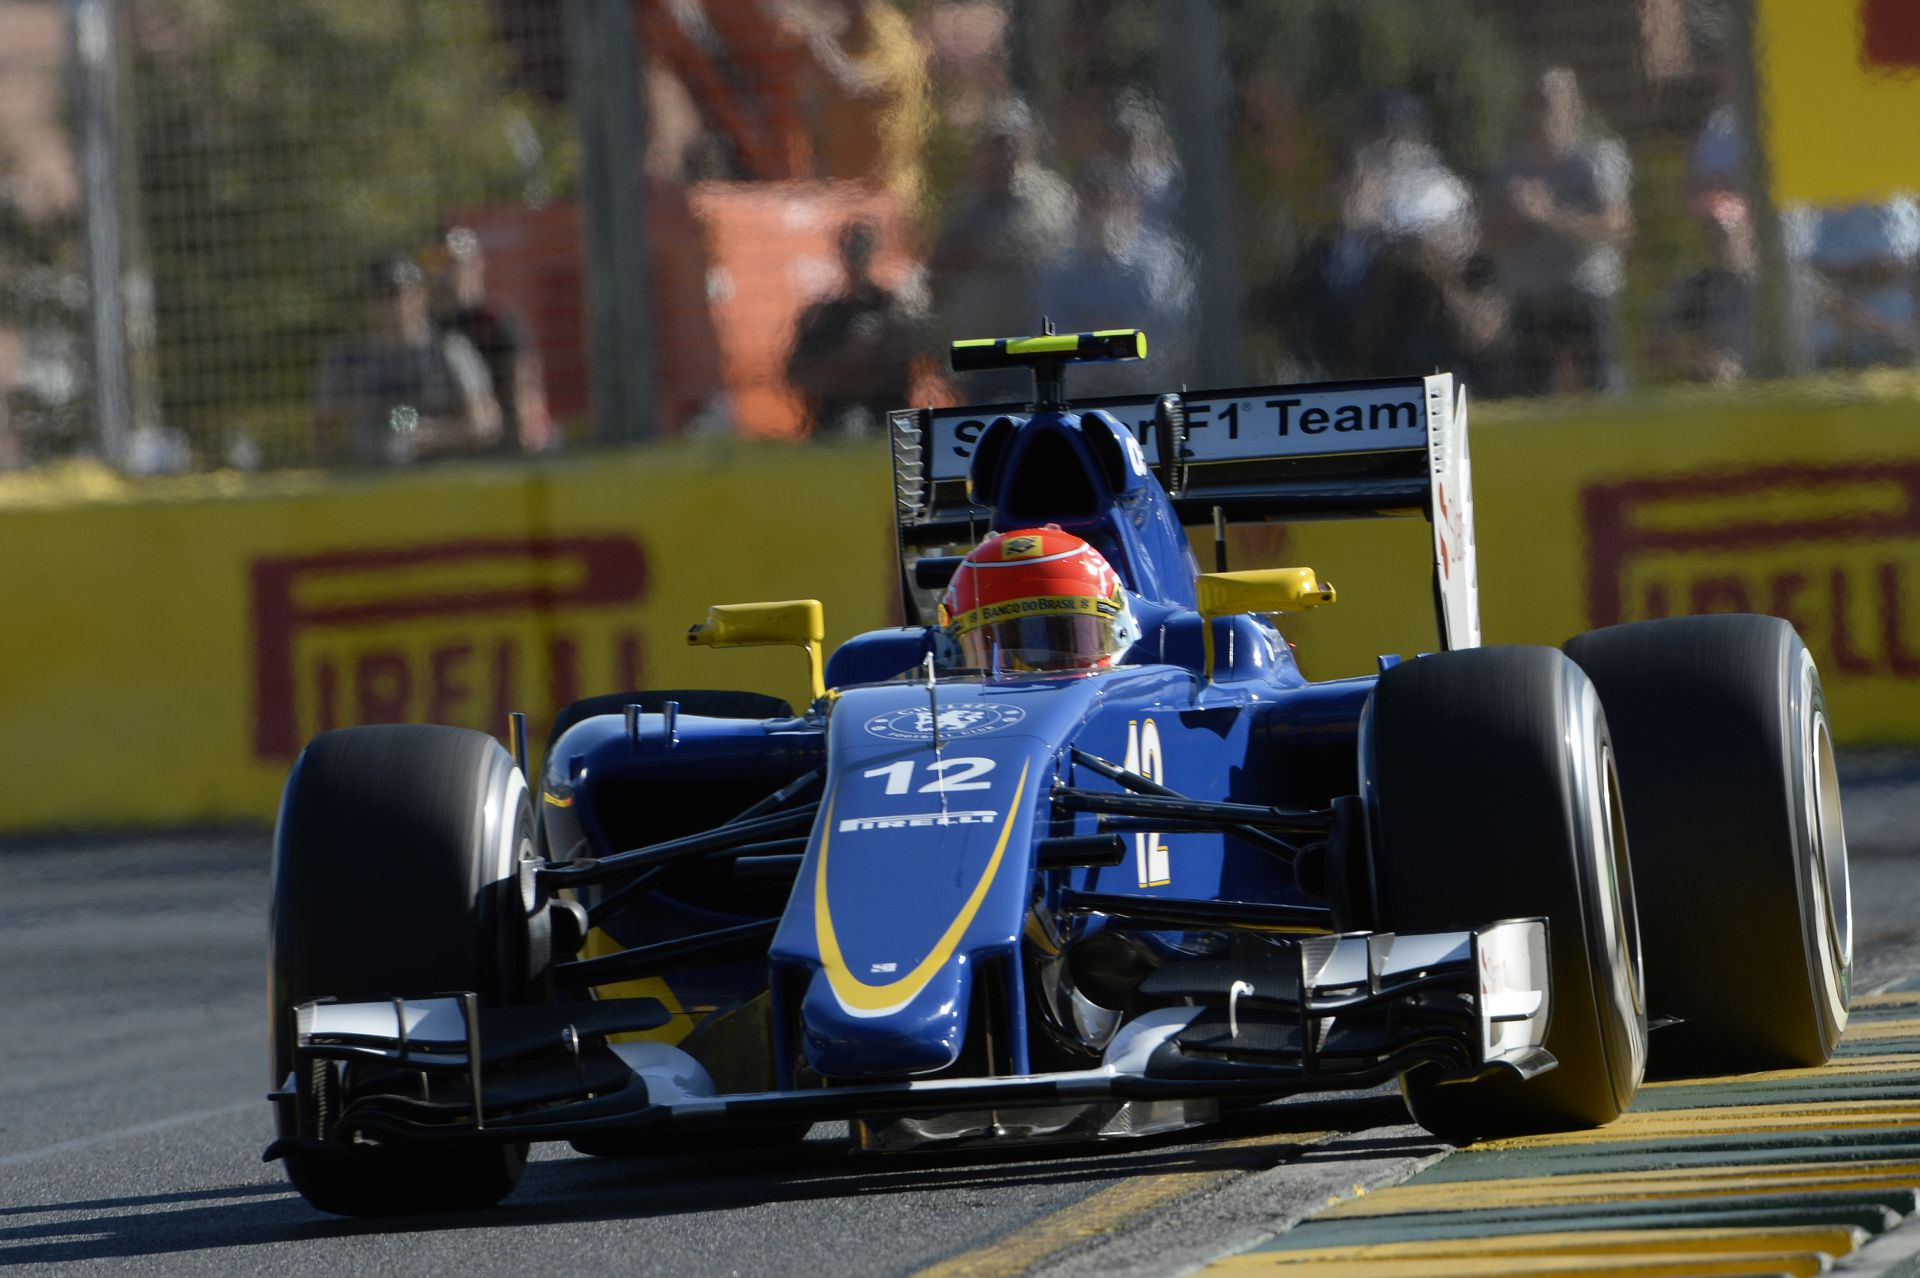 A Sauber meglepődött Giedo van der Garde kijelentésén